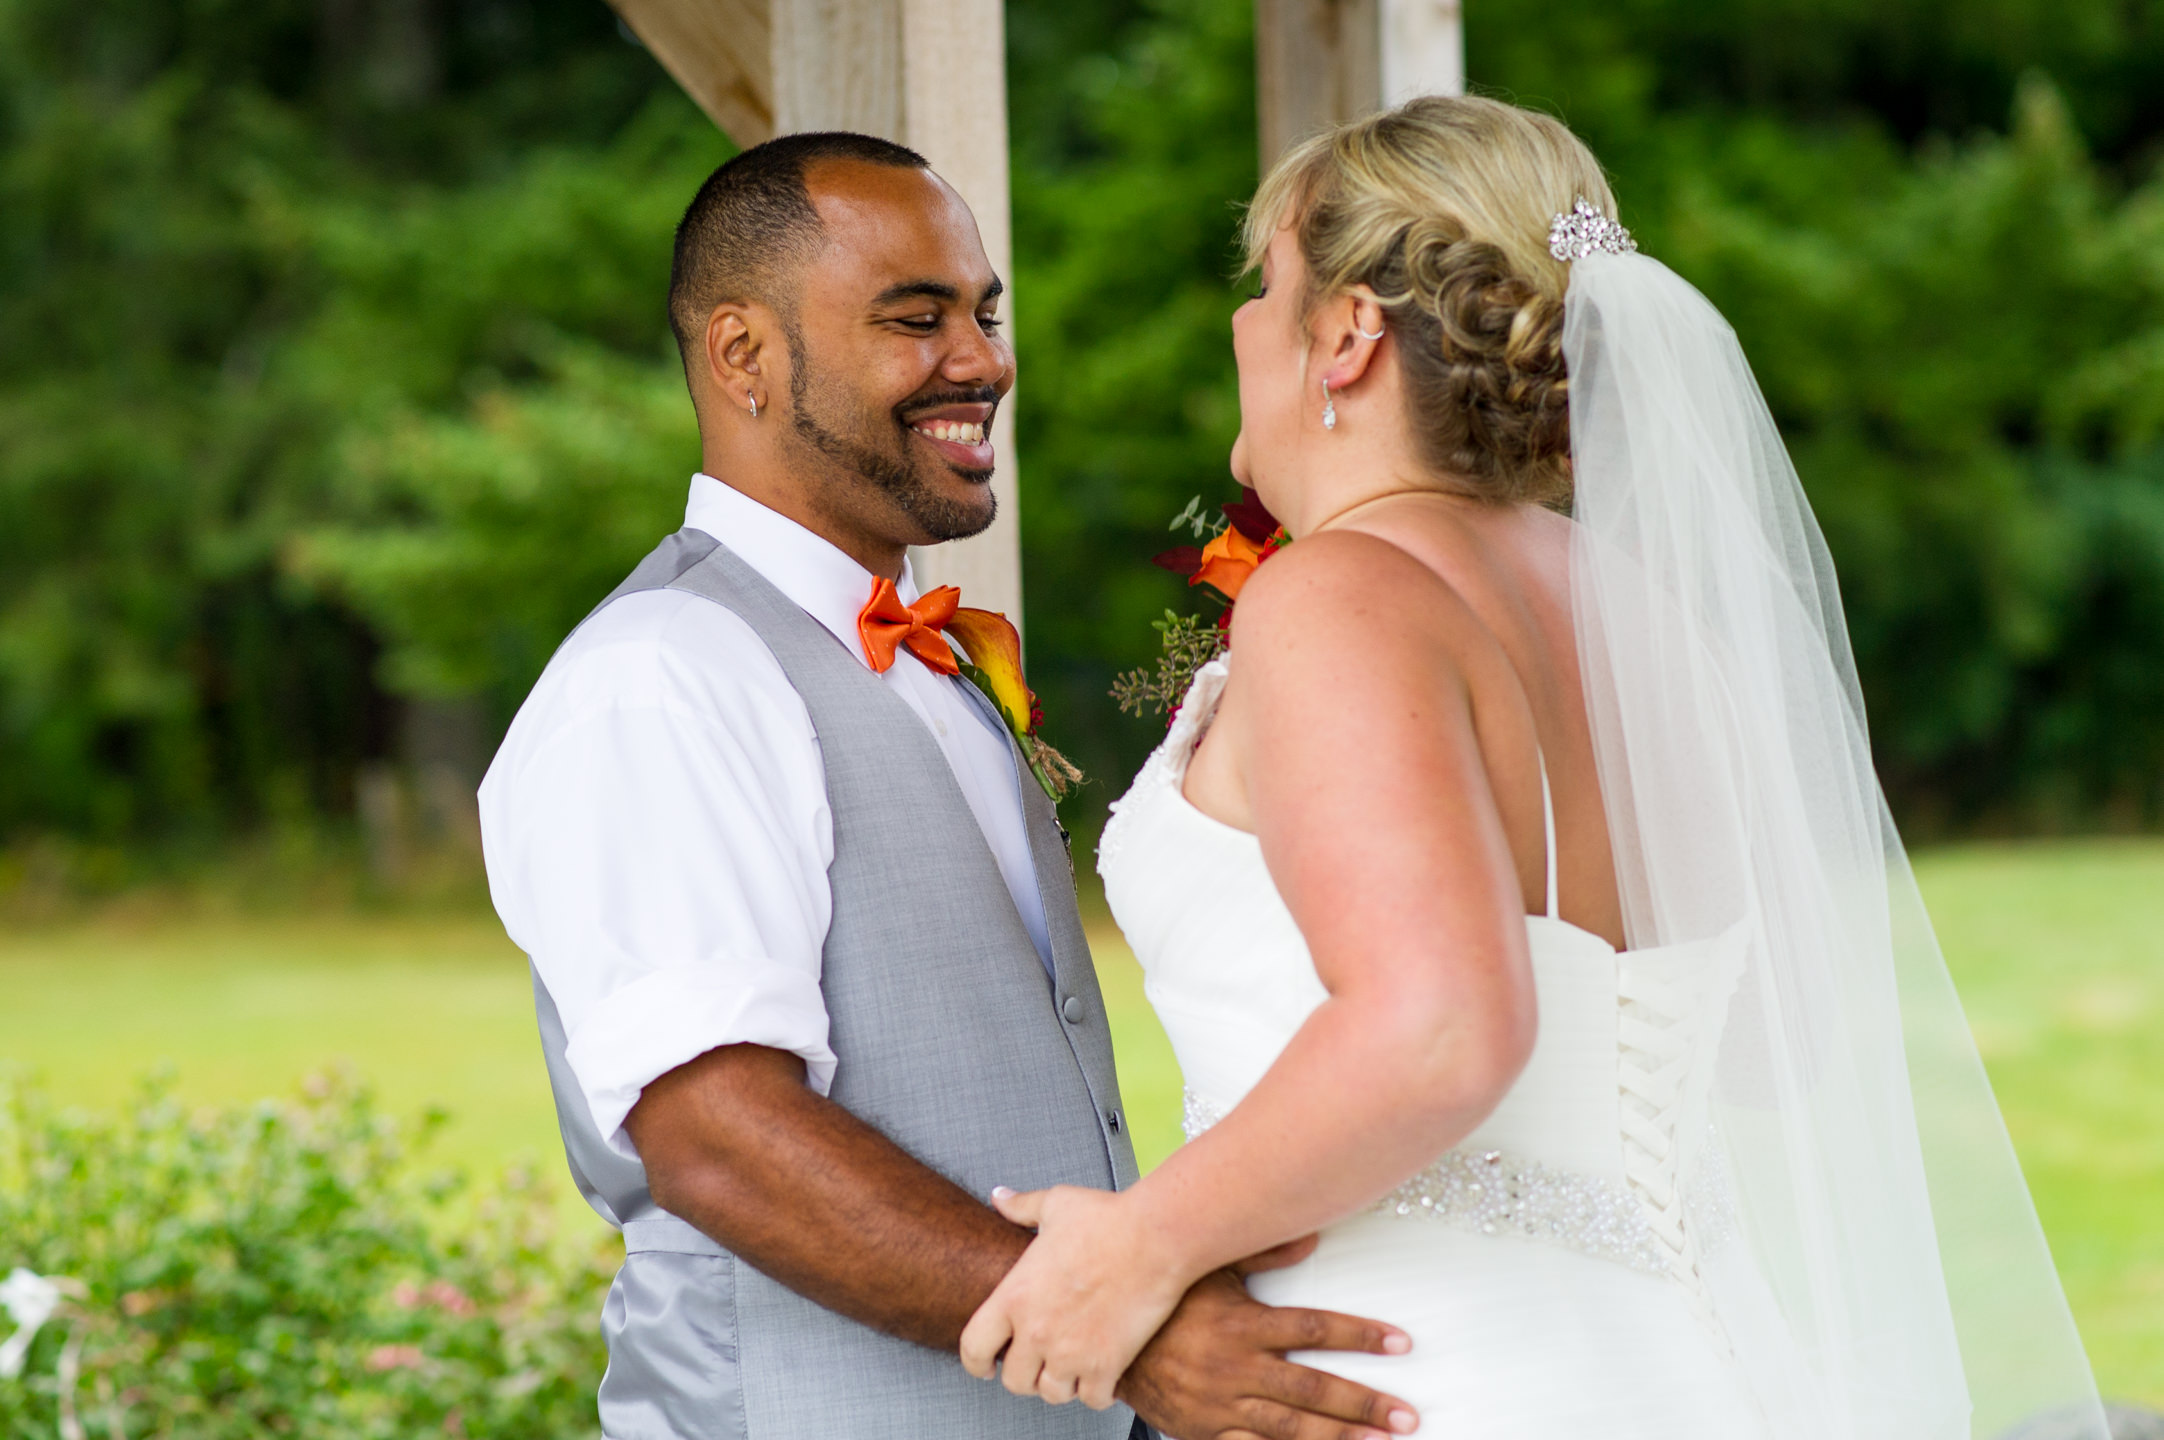 20160917_Tat_Renee and Marcus Wedding-21.jpg